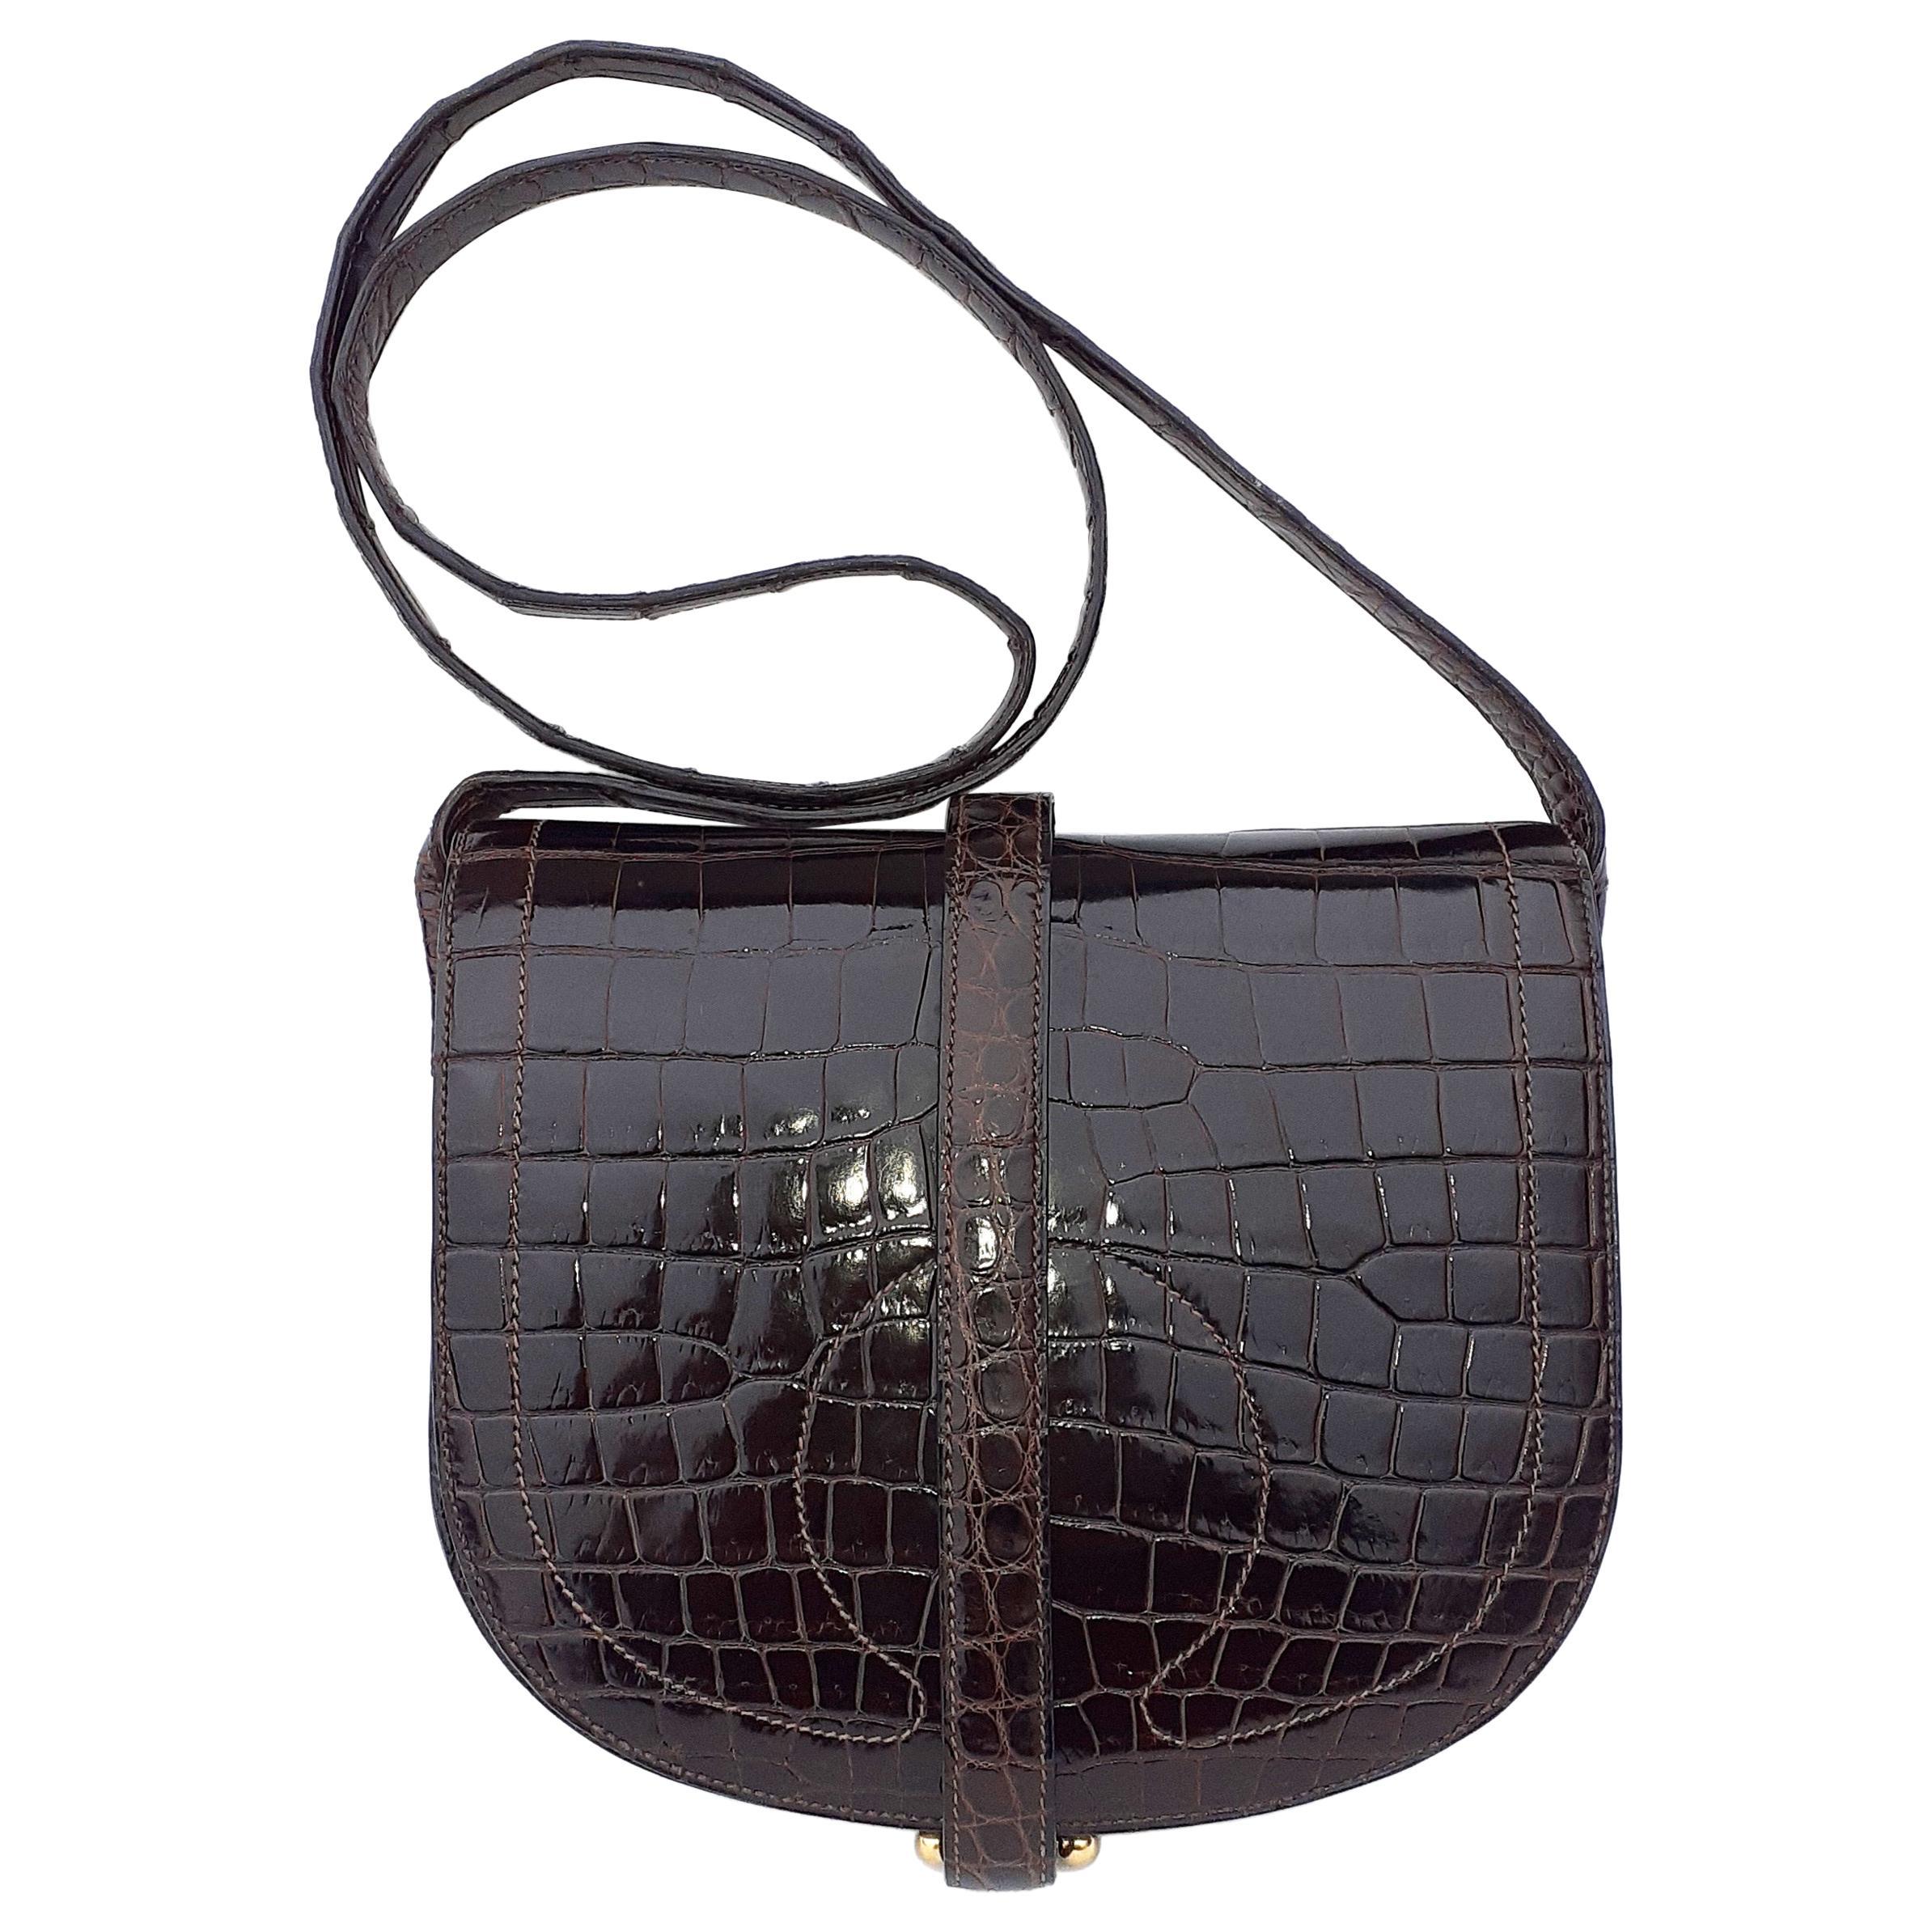 Exceptional Hermès Shoulder Bag Shiny Brown Crocodile Pororus Gold Hdw RARE